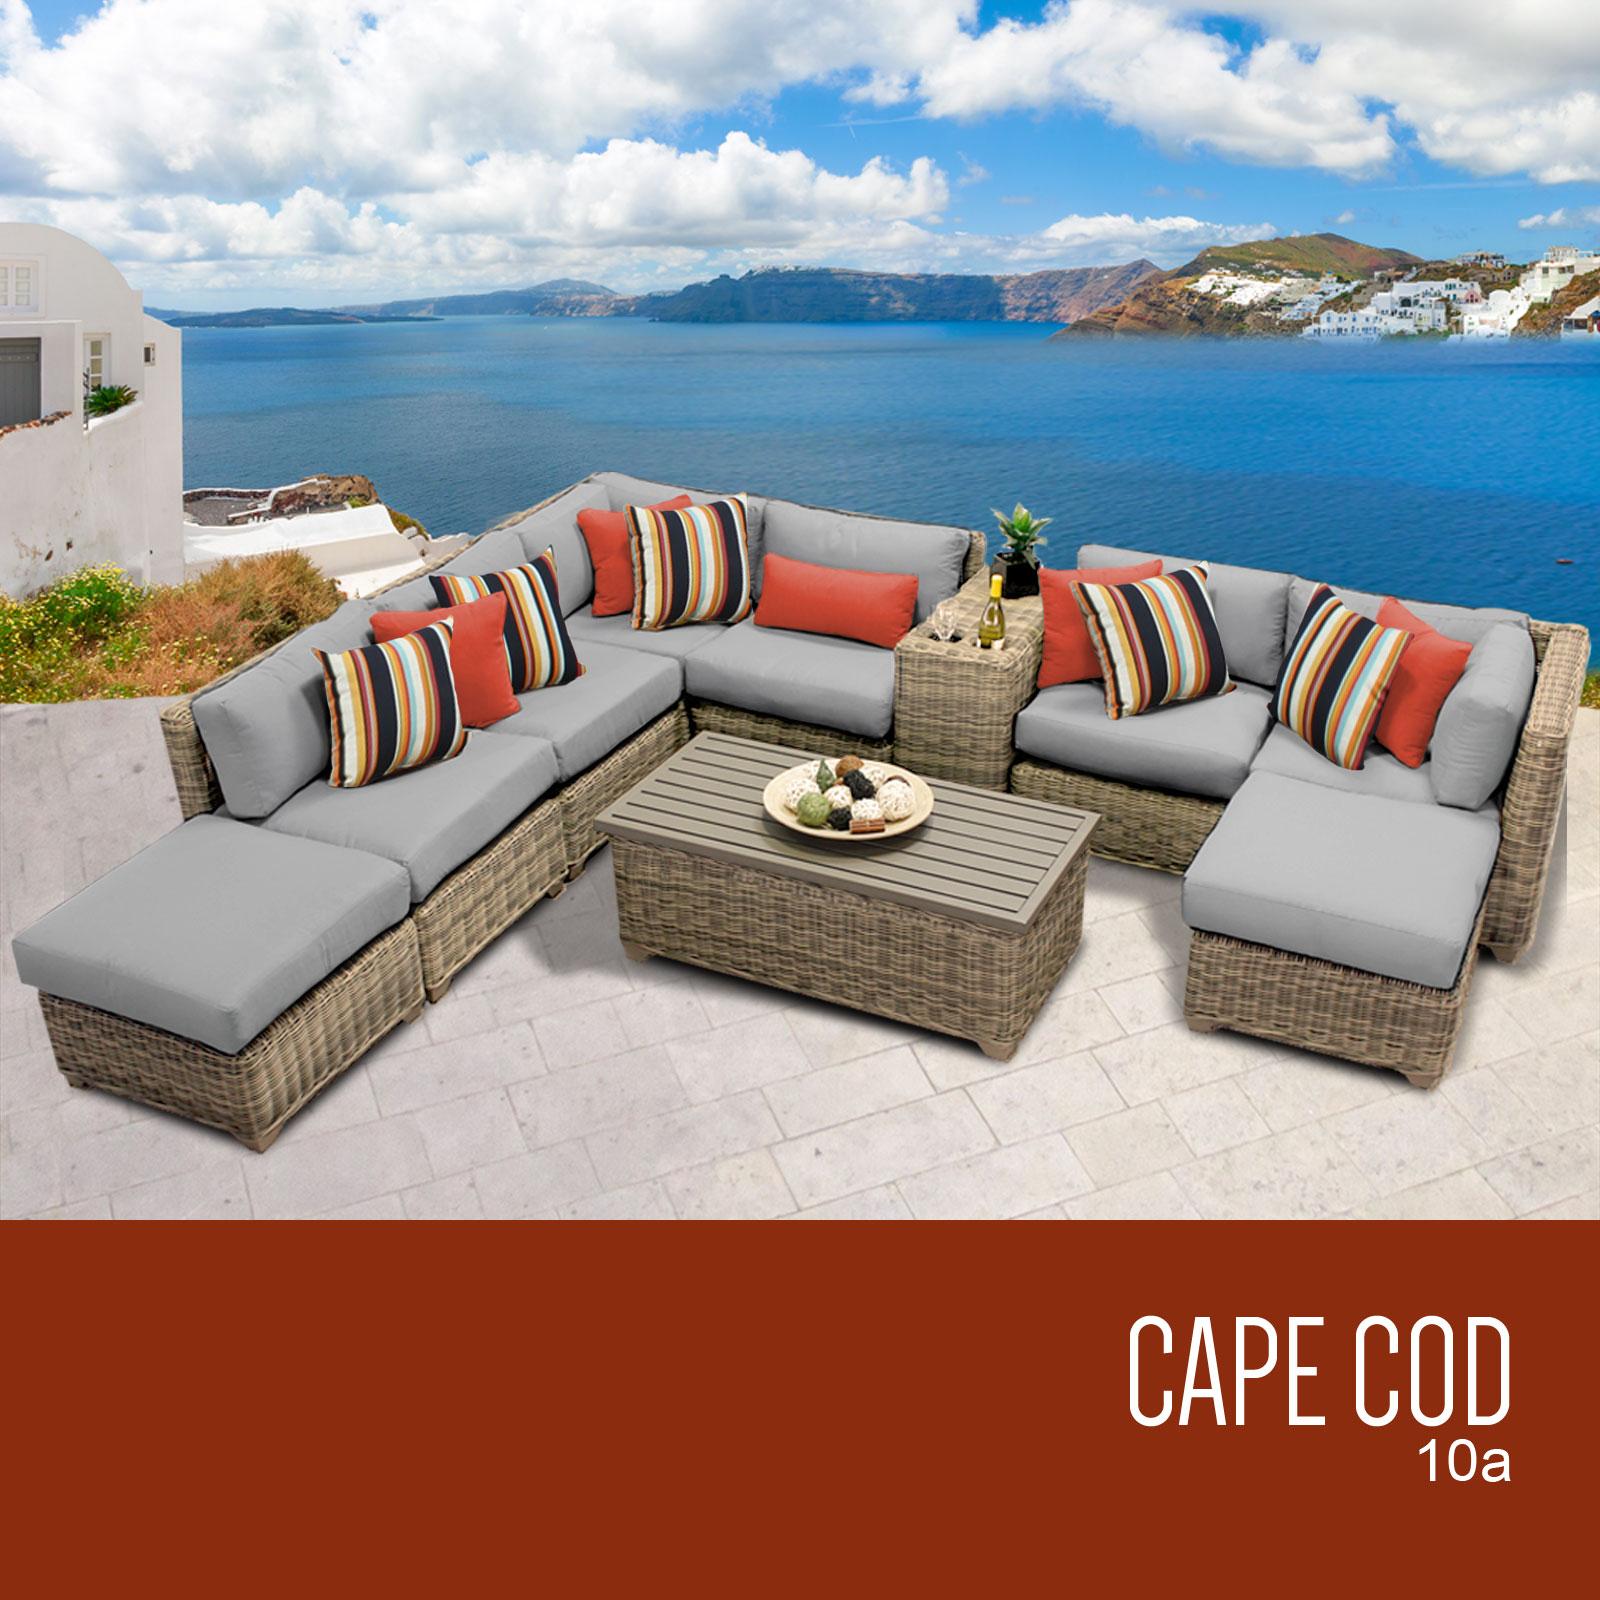 Grey Cape Cod 10 Piece Outdoor Wicker Patio Furniture Set 10a